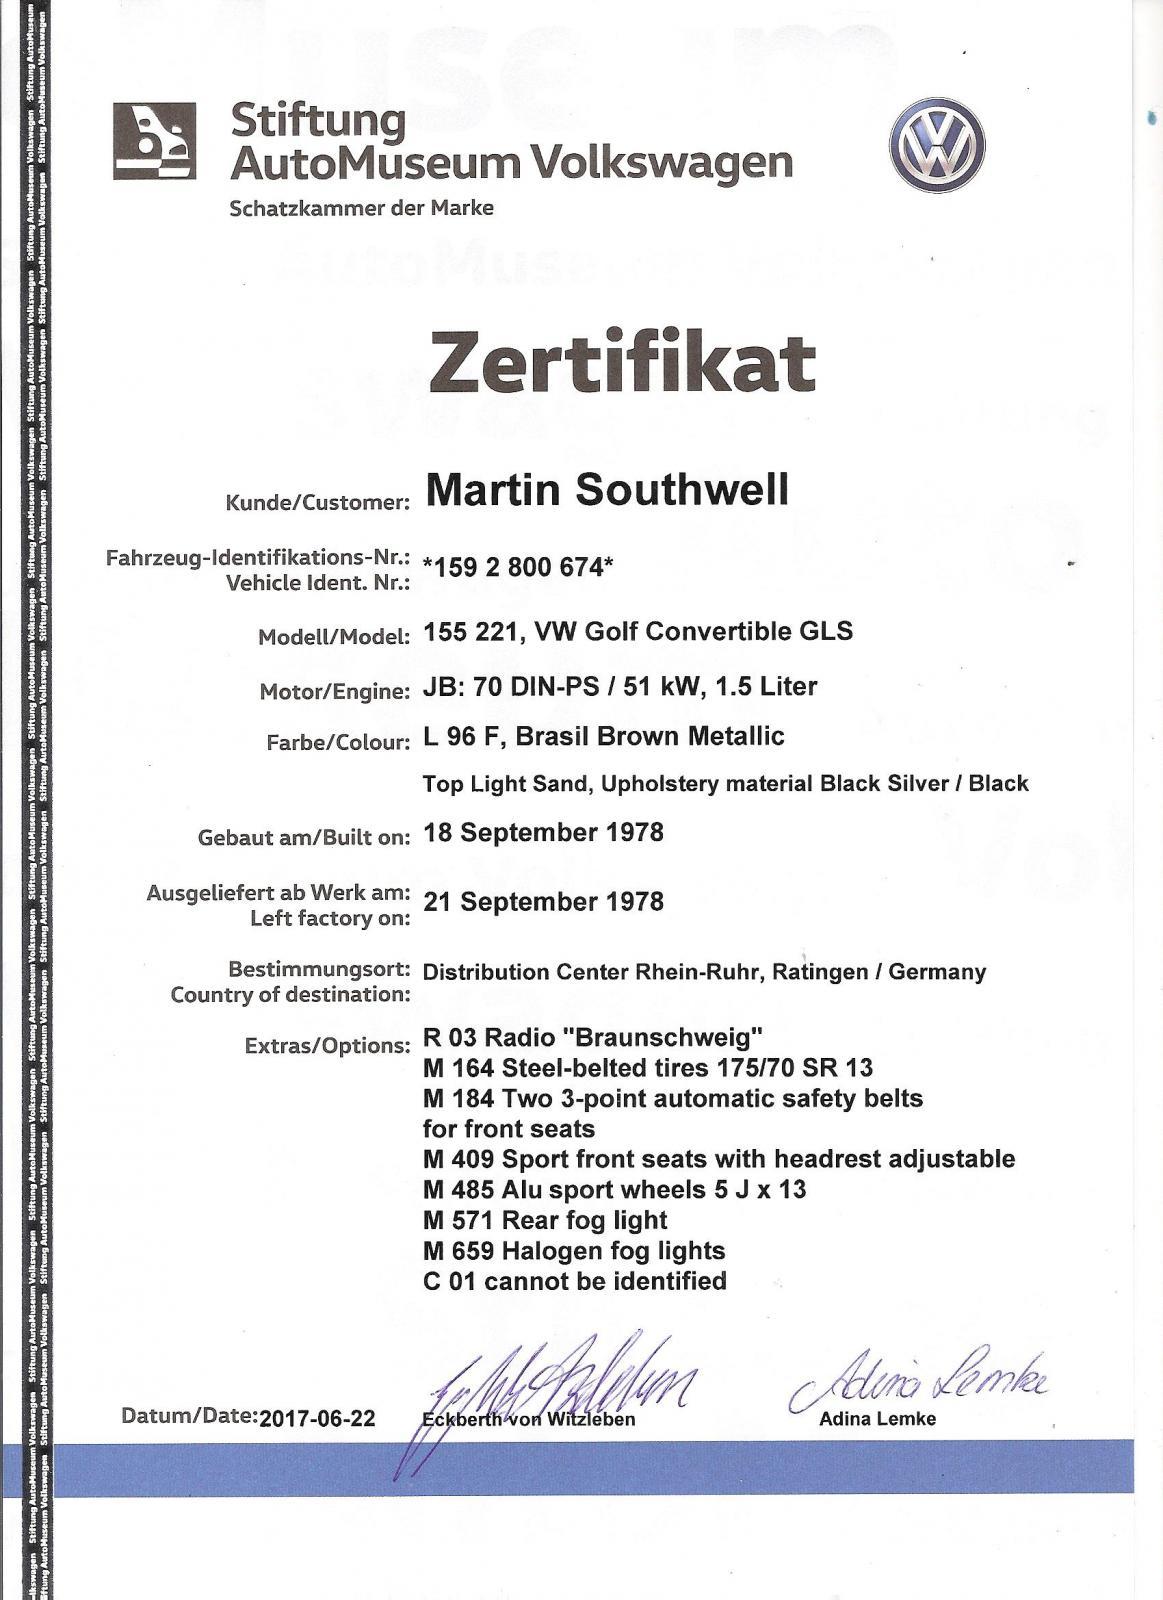 Thesamba Gallery 1978 Vw Golf Convertible Birth Certificate